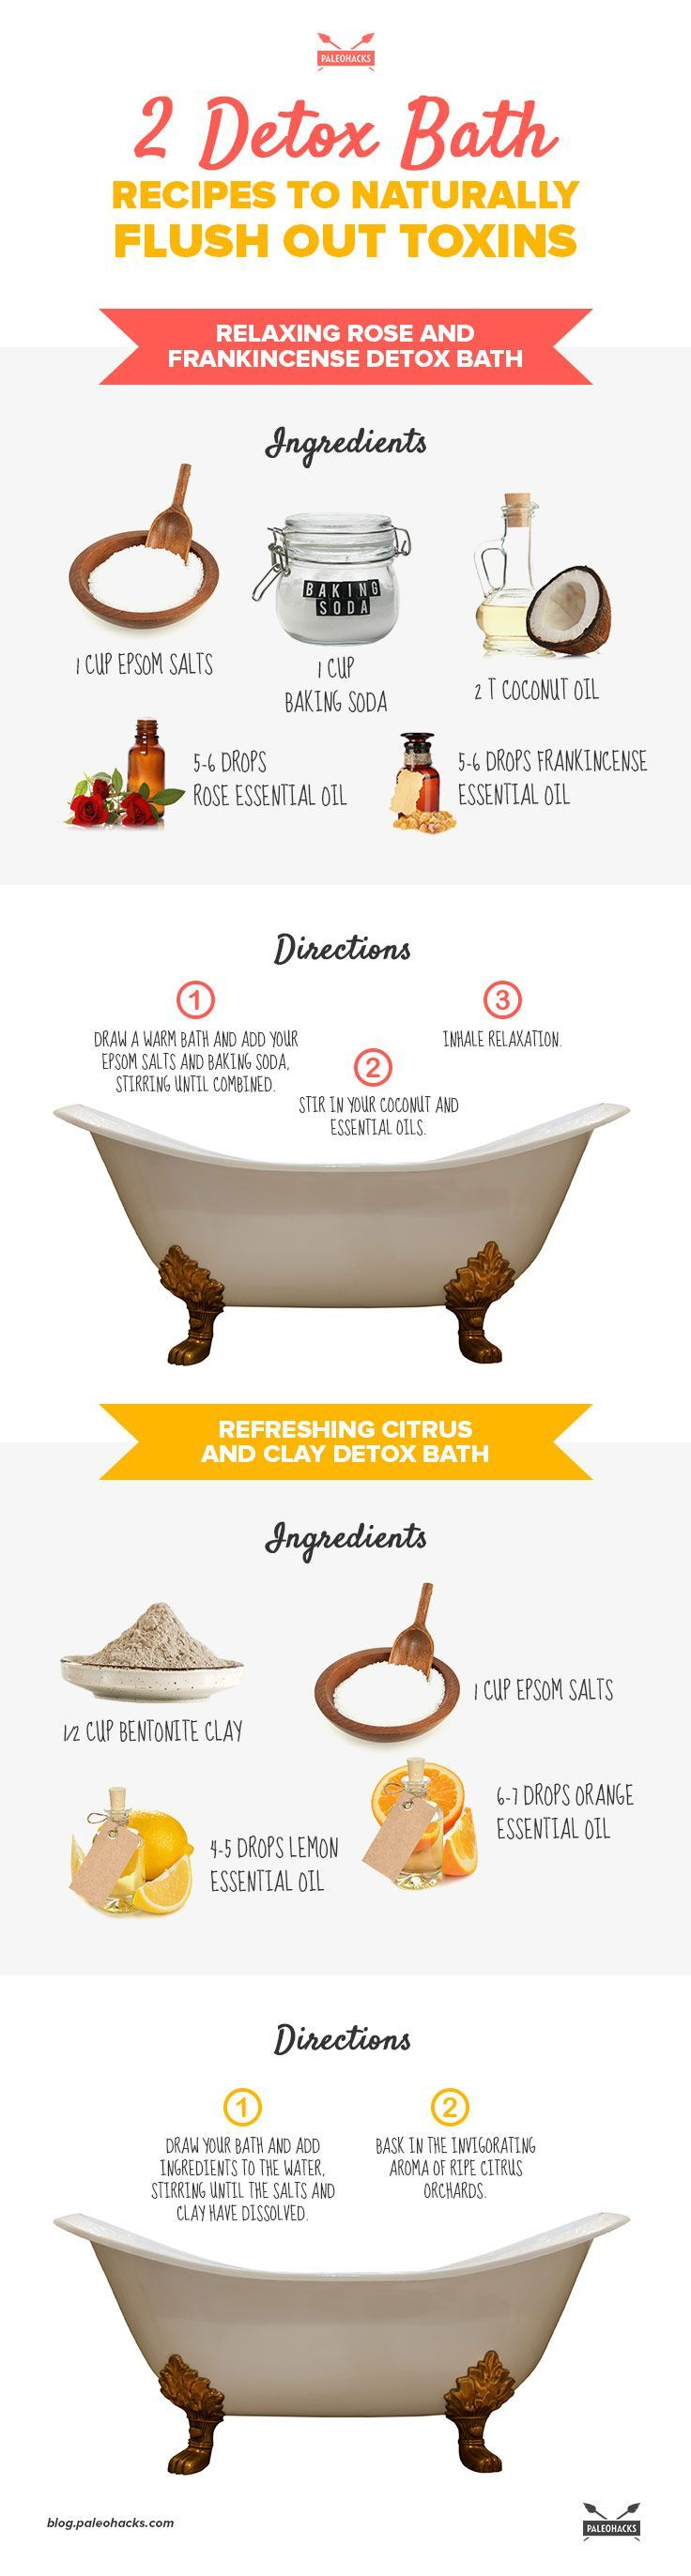 2 Detox Bath Recipes to Naturally Flush Out Toxins